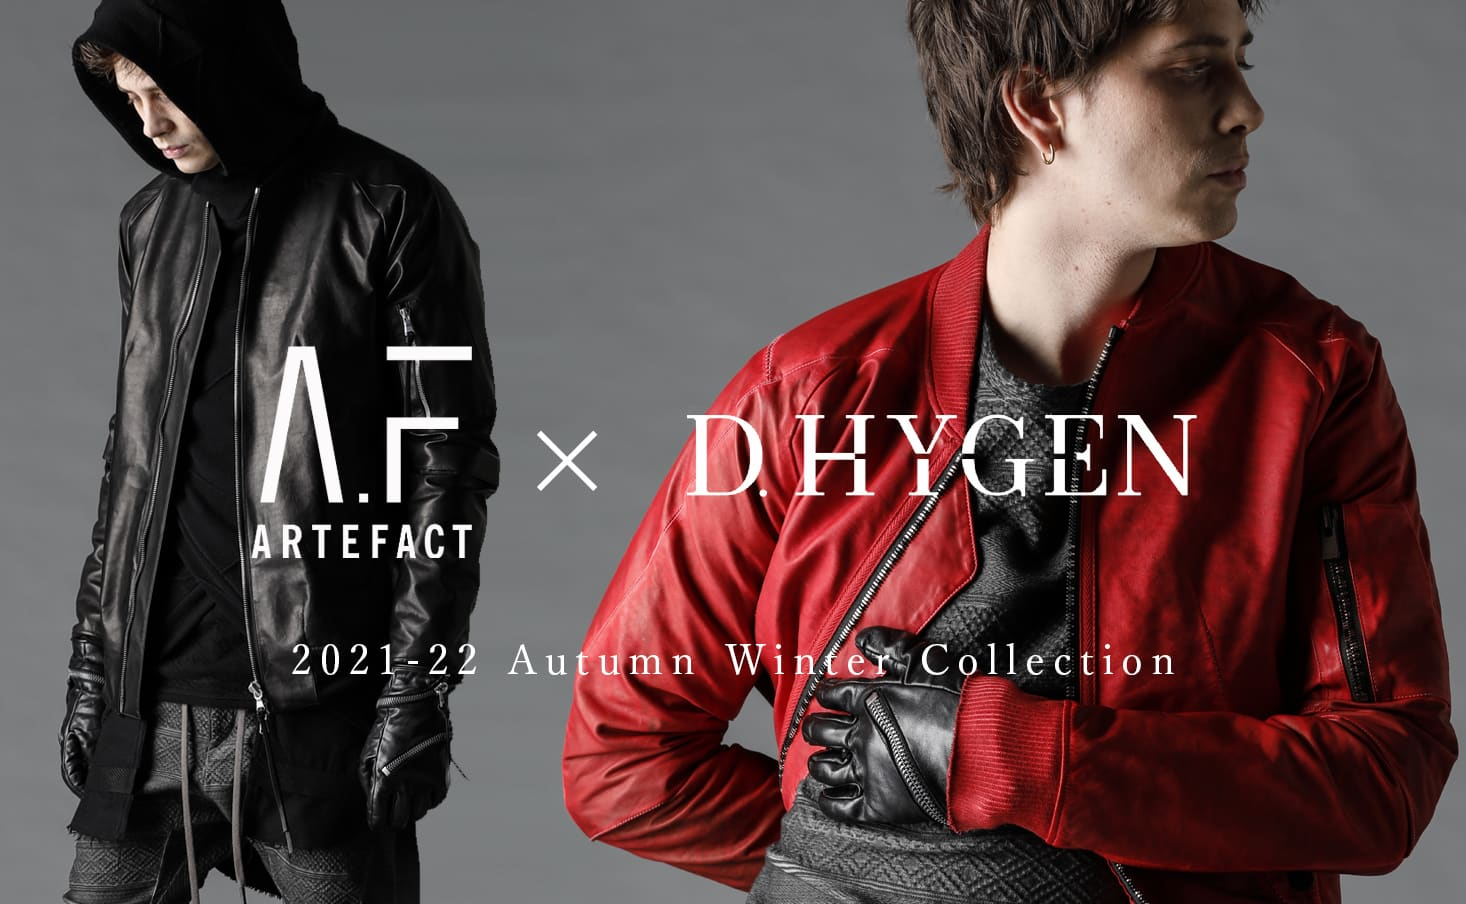 D.HYGEN 2021-22 AW Collection